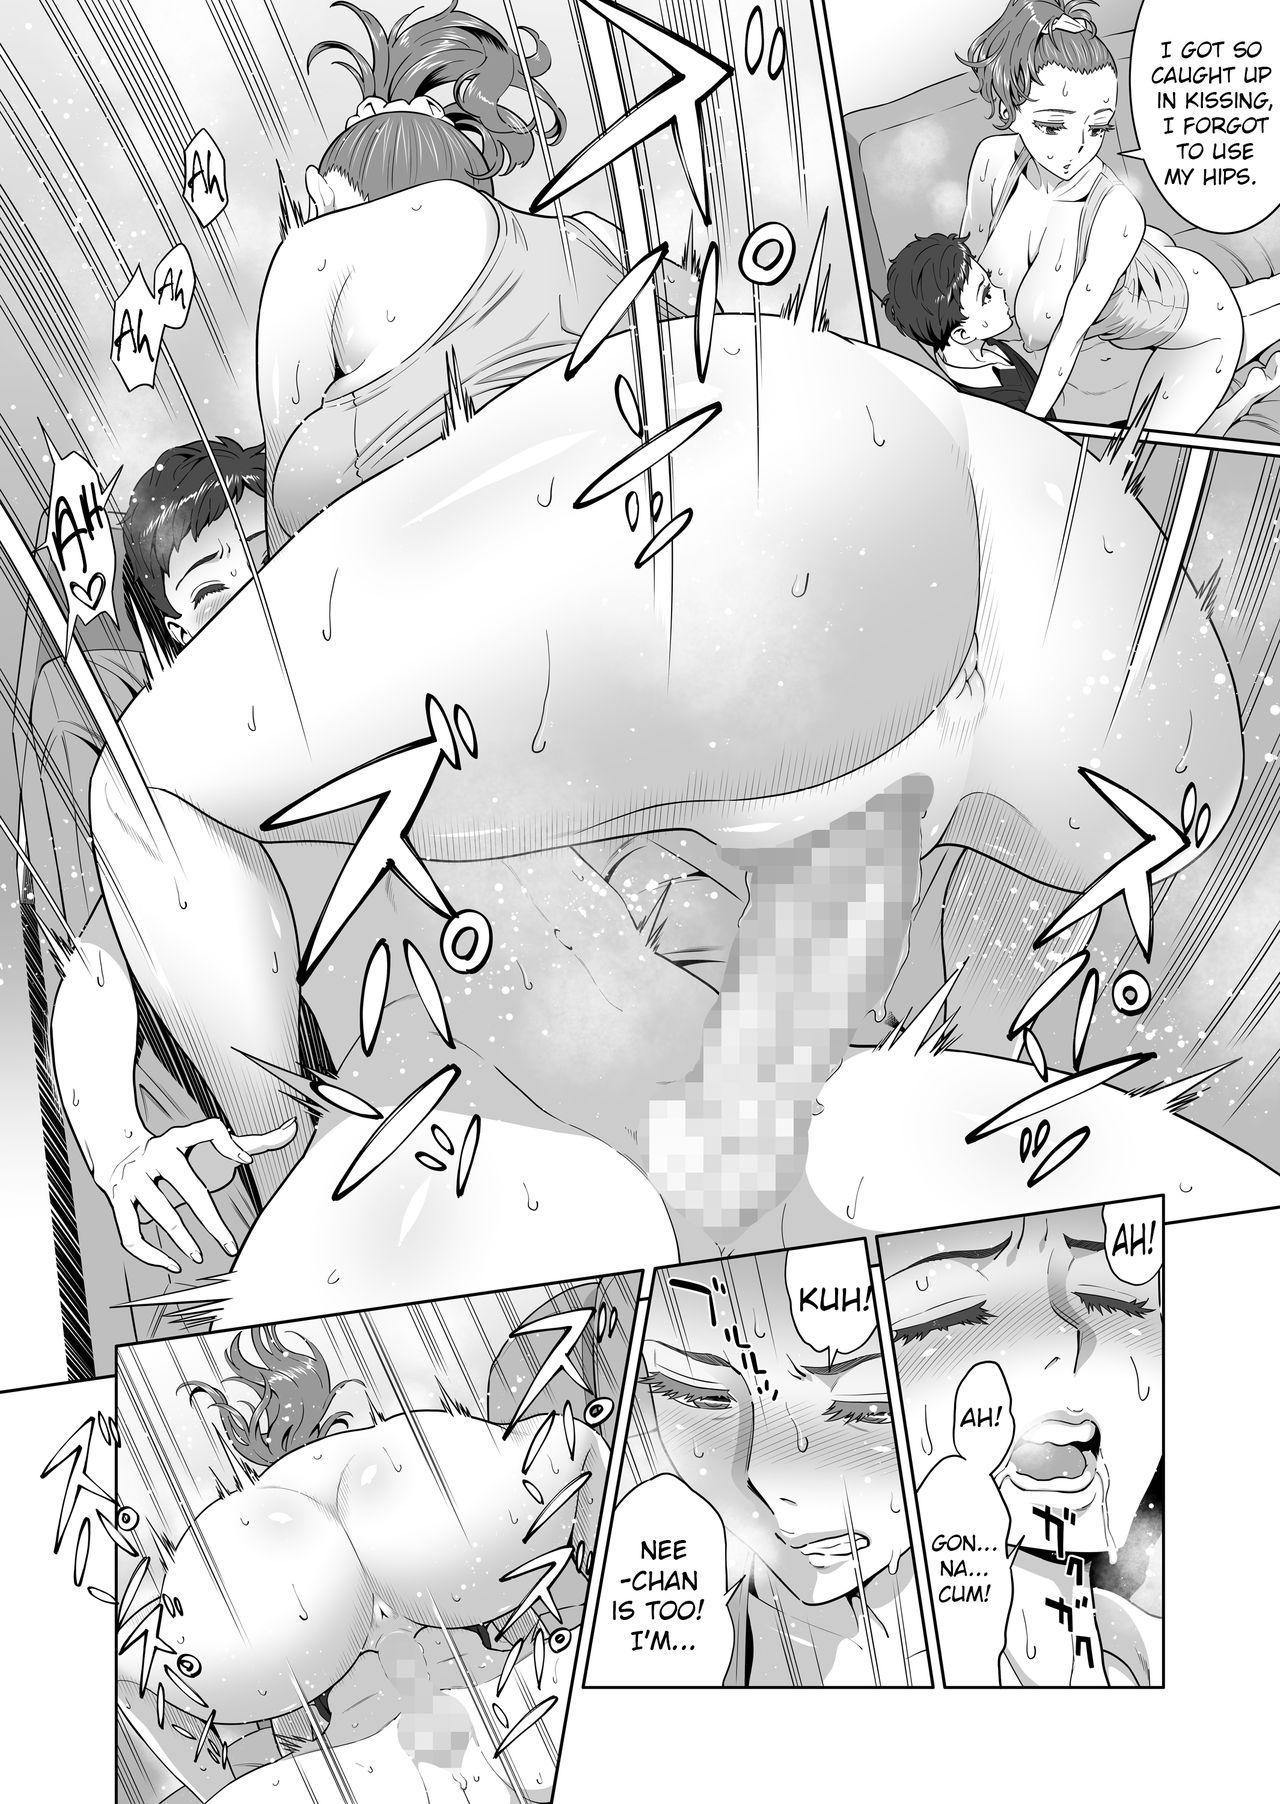 [RED Paprika (Aka P)] Ayu-nee Kocchi Muite   Ayu-nee look this way [English] [AnotsuSagami] 23